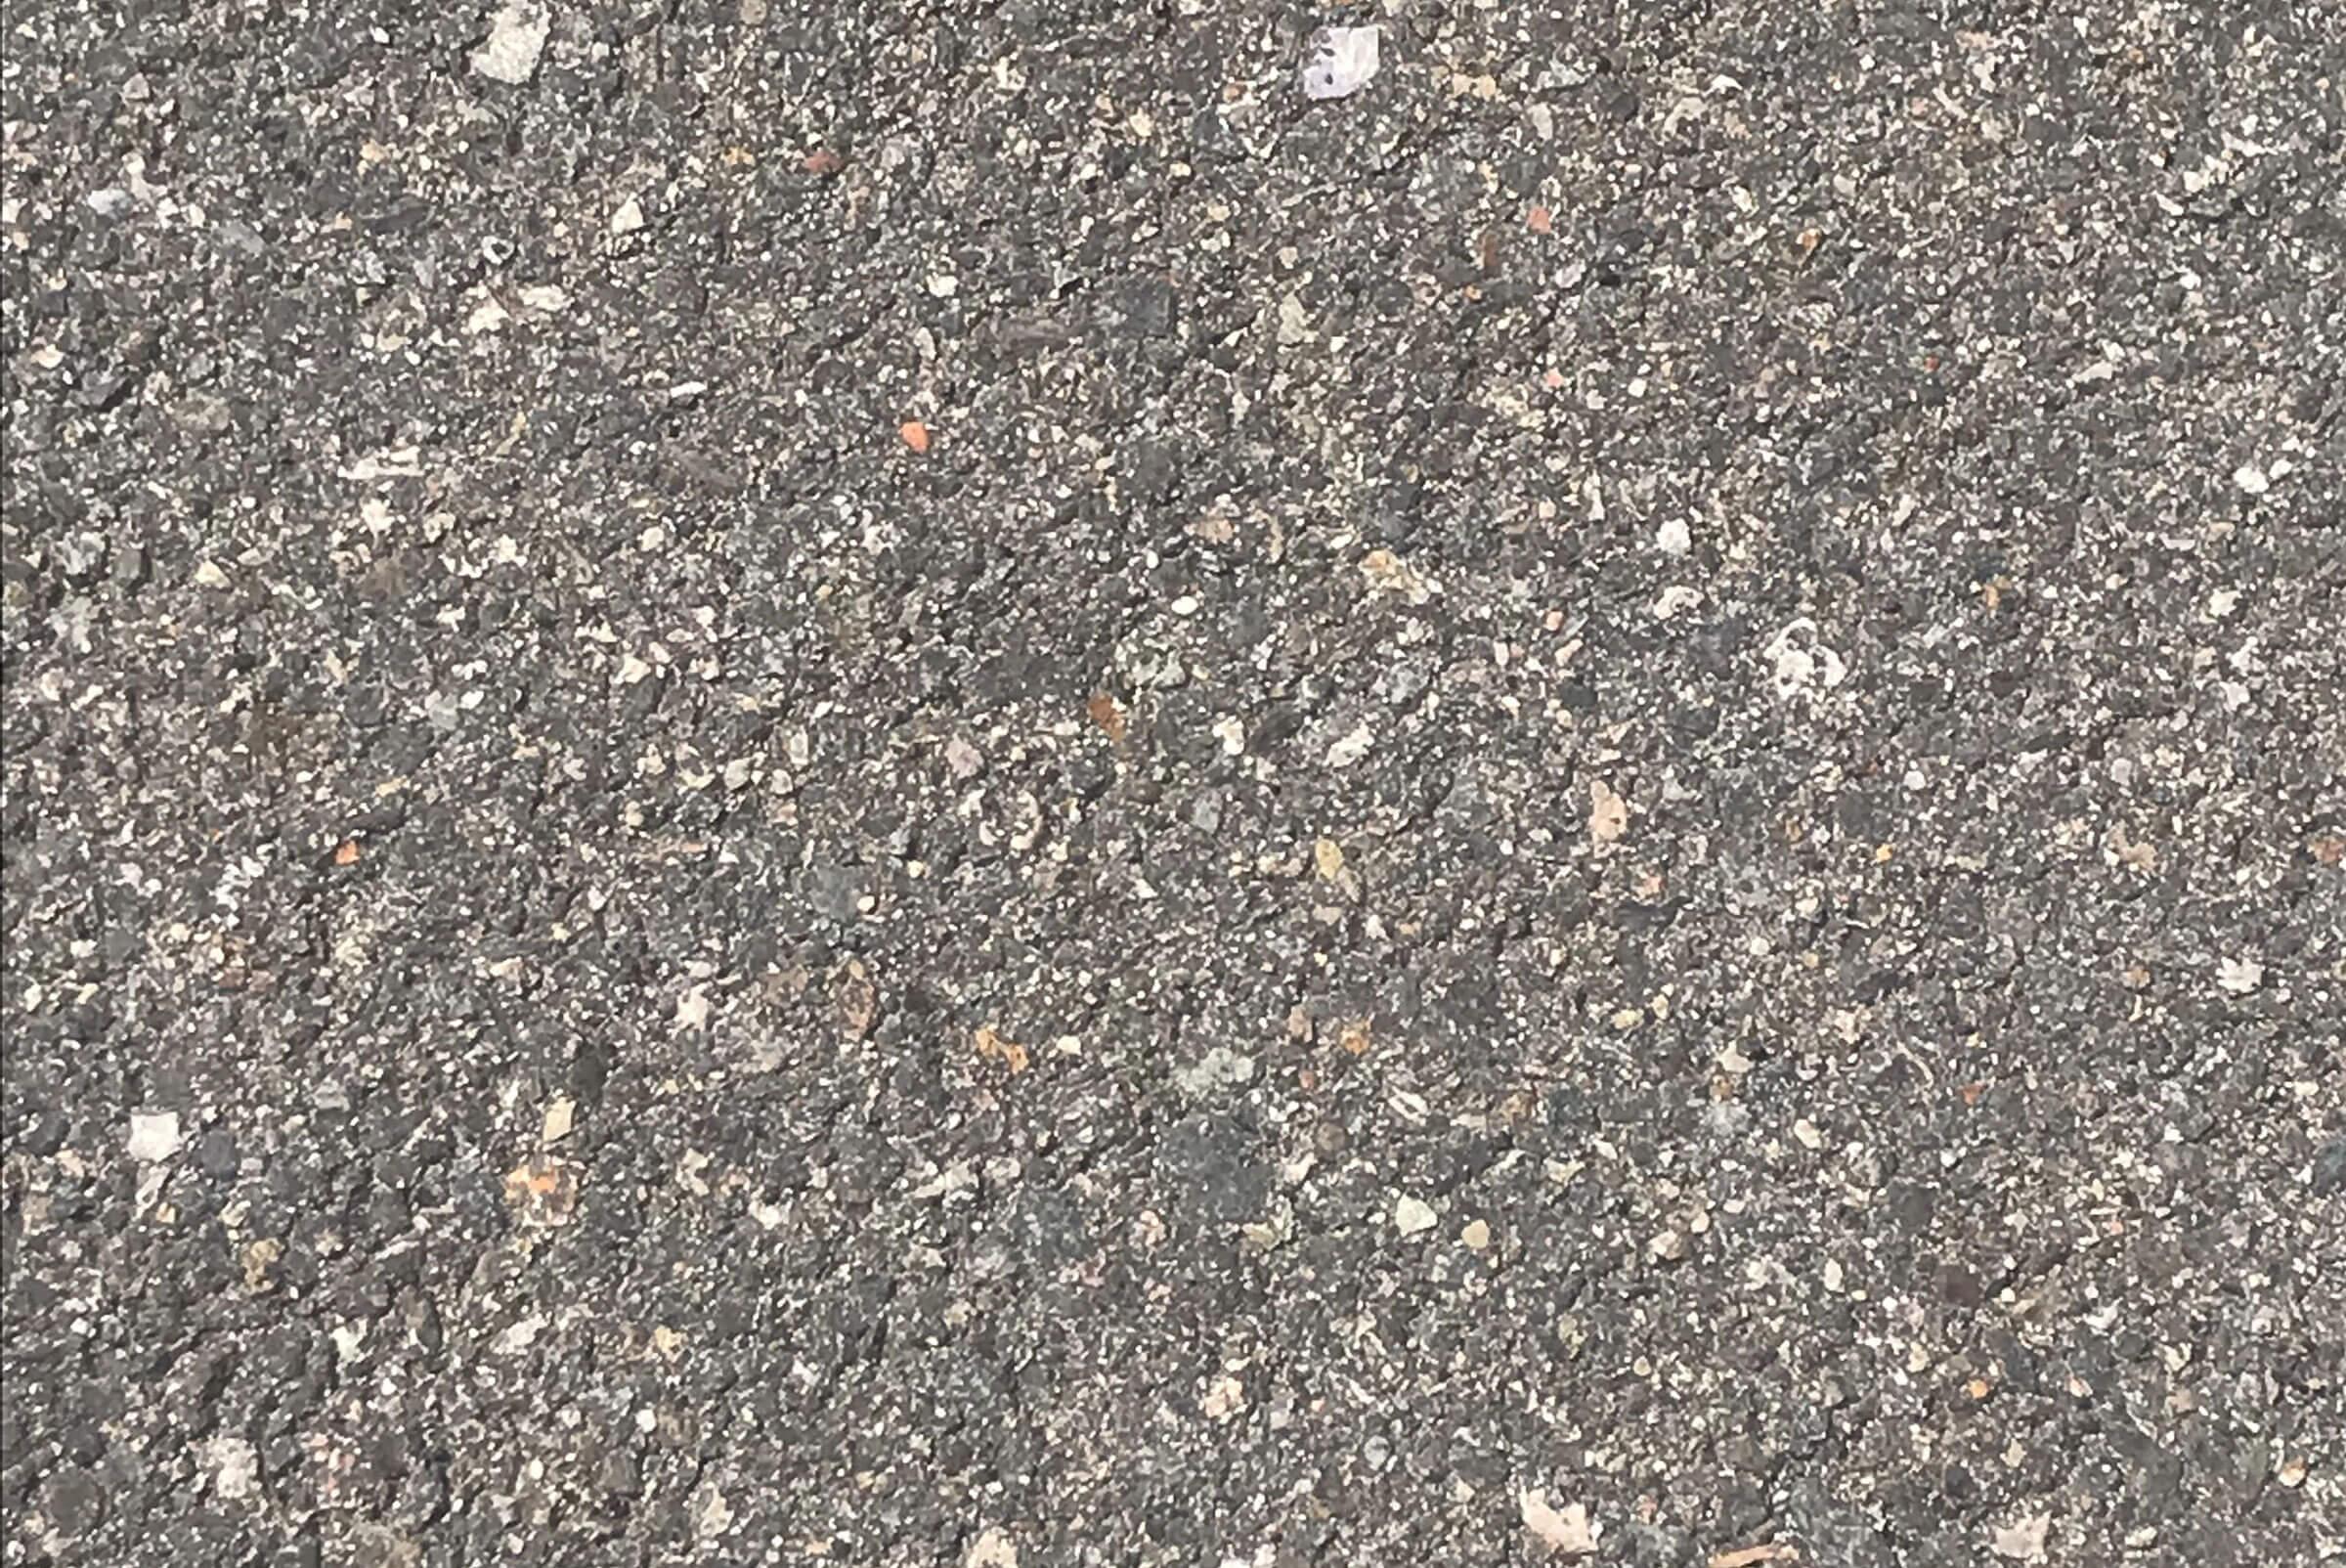 Asphalt Driveway Care